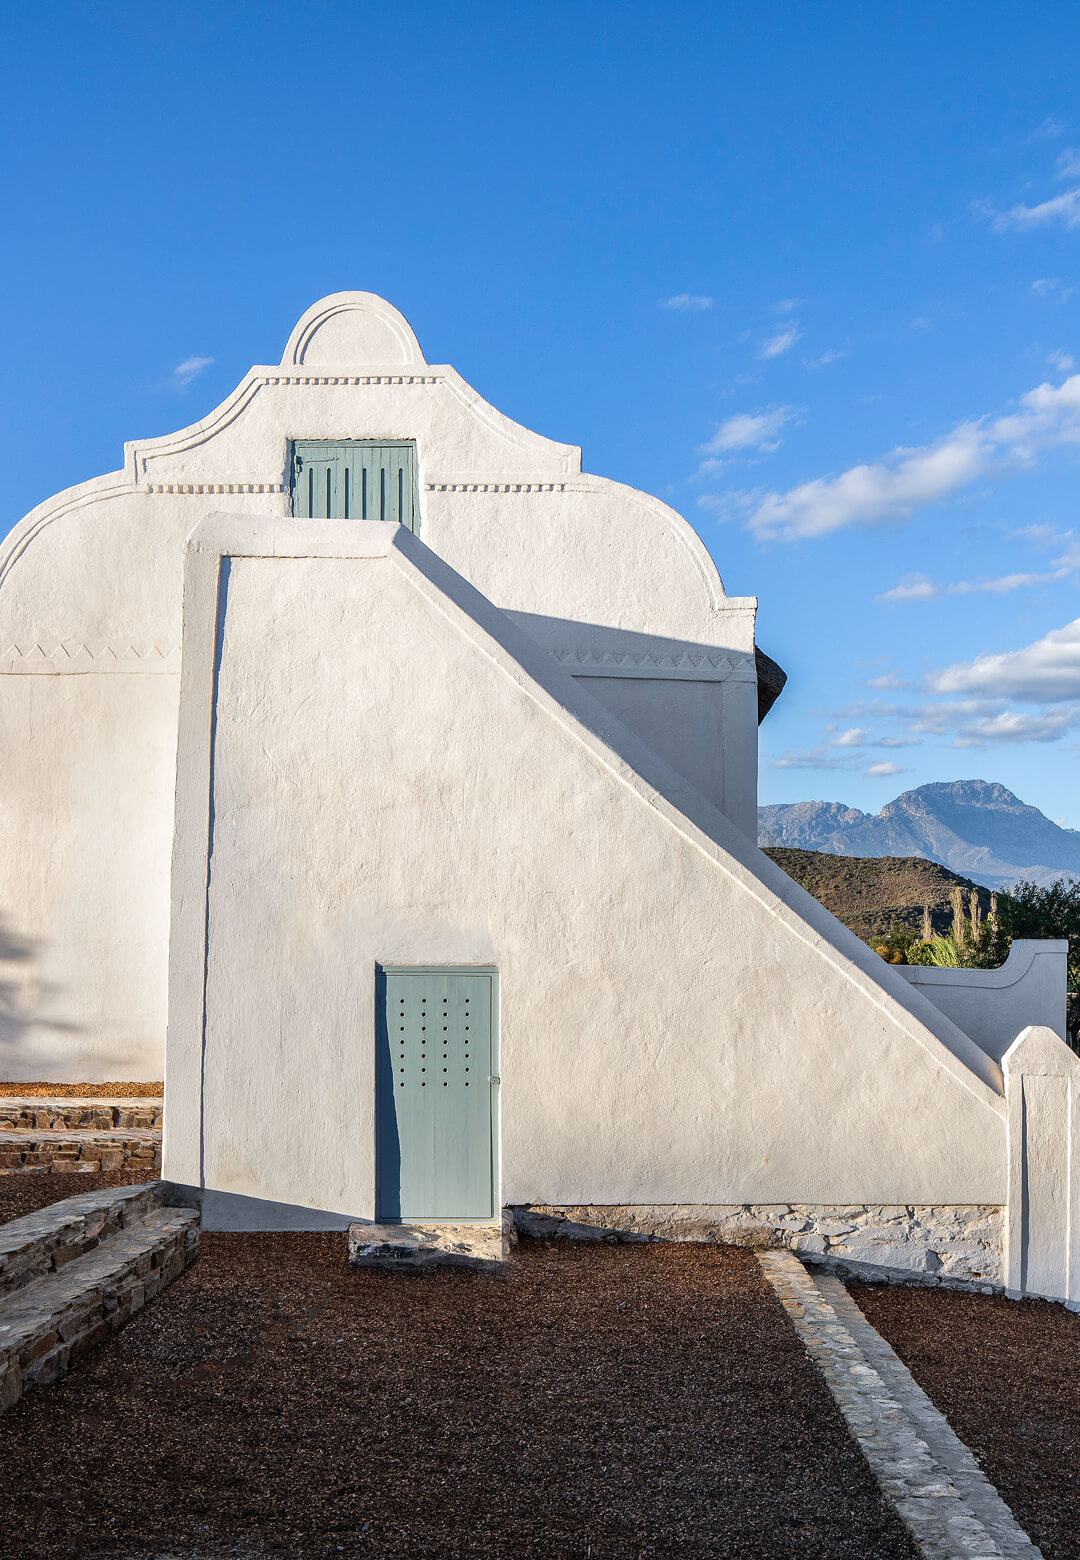 Buffelsdrift Farm in South Africa restored by Jaco Booyens Architect and SAOTA  | Buffelsdrift Farm | Jaco Booyens Architect Saoto| STIRworld